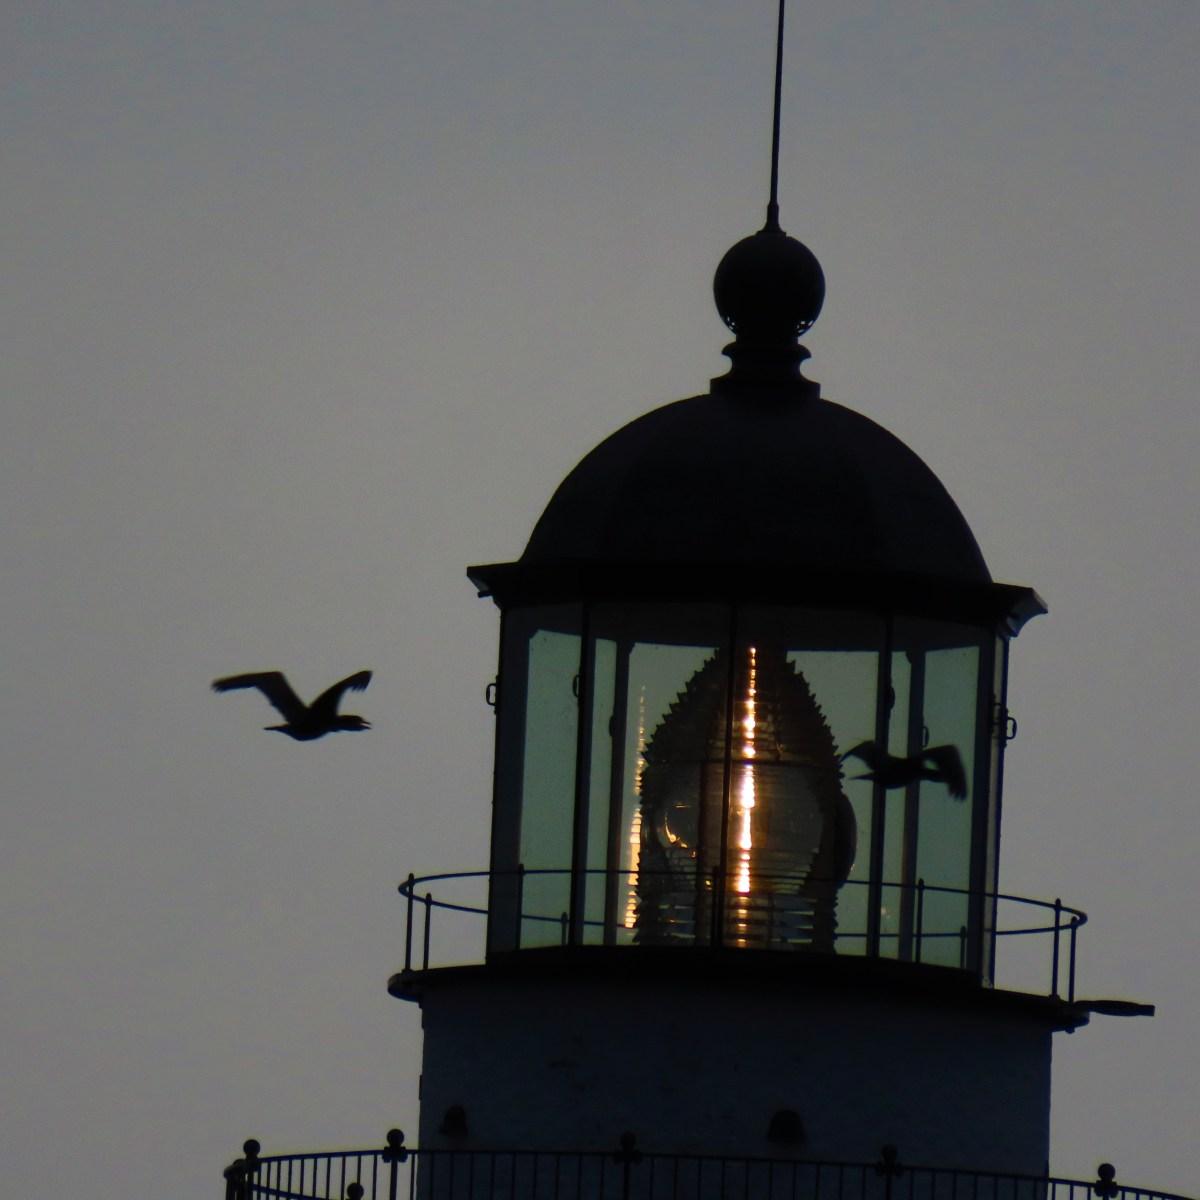 Cormorants flying past a lighthouse